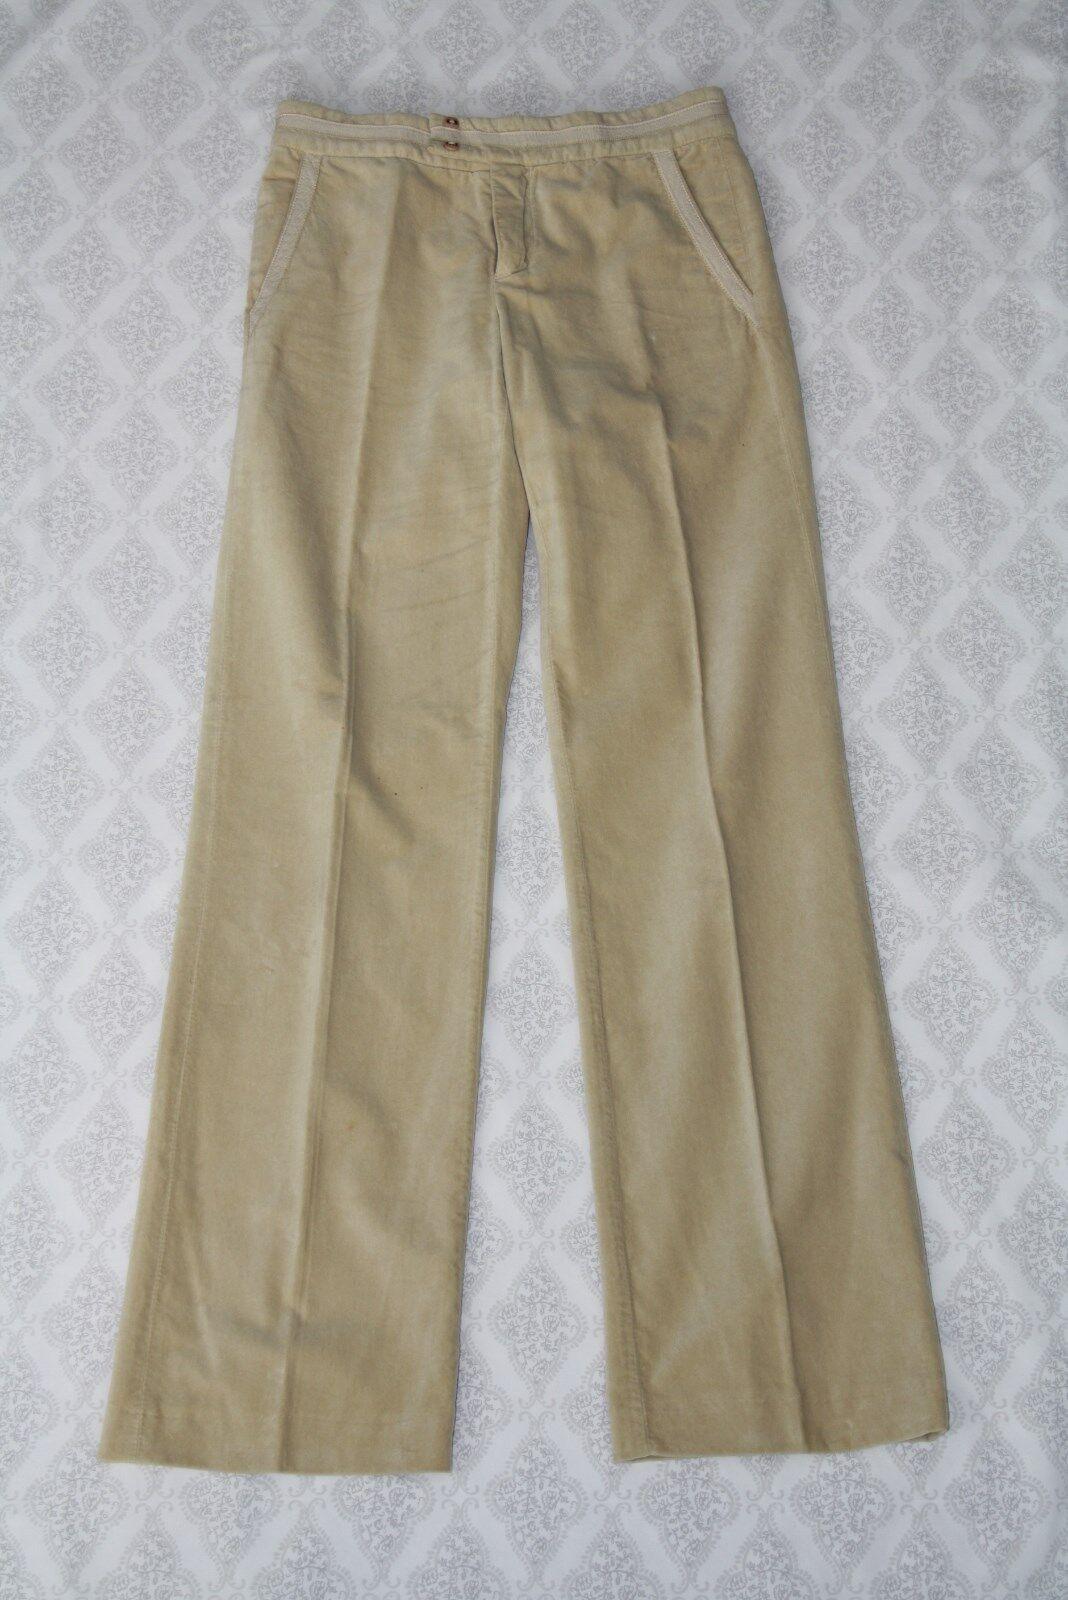 Marc Jacobs Designer Corduroy Straight Leg Dress Pants (Größe 2)